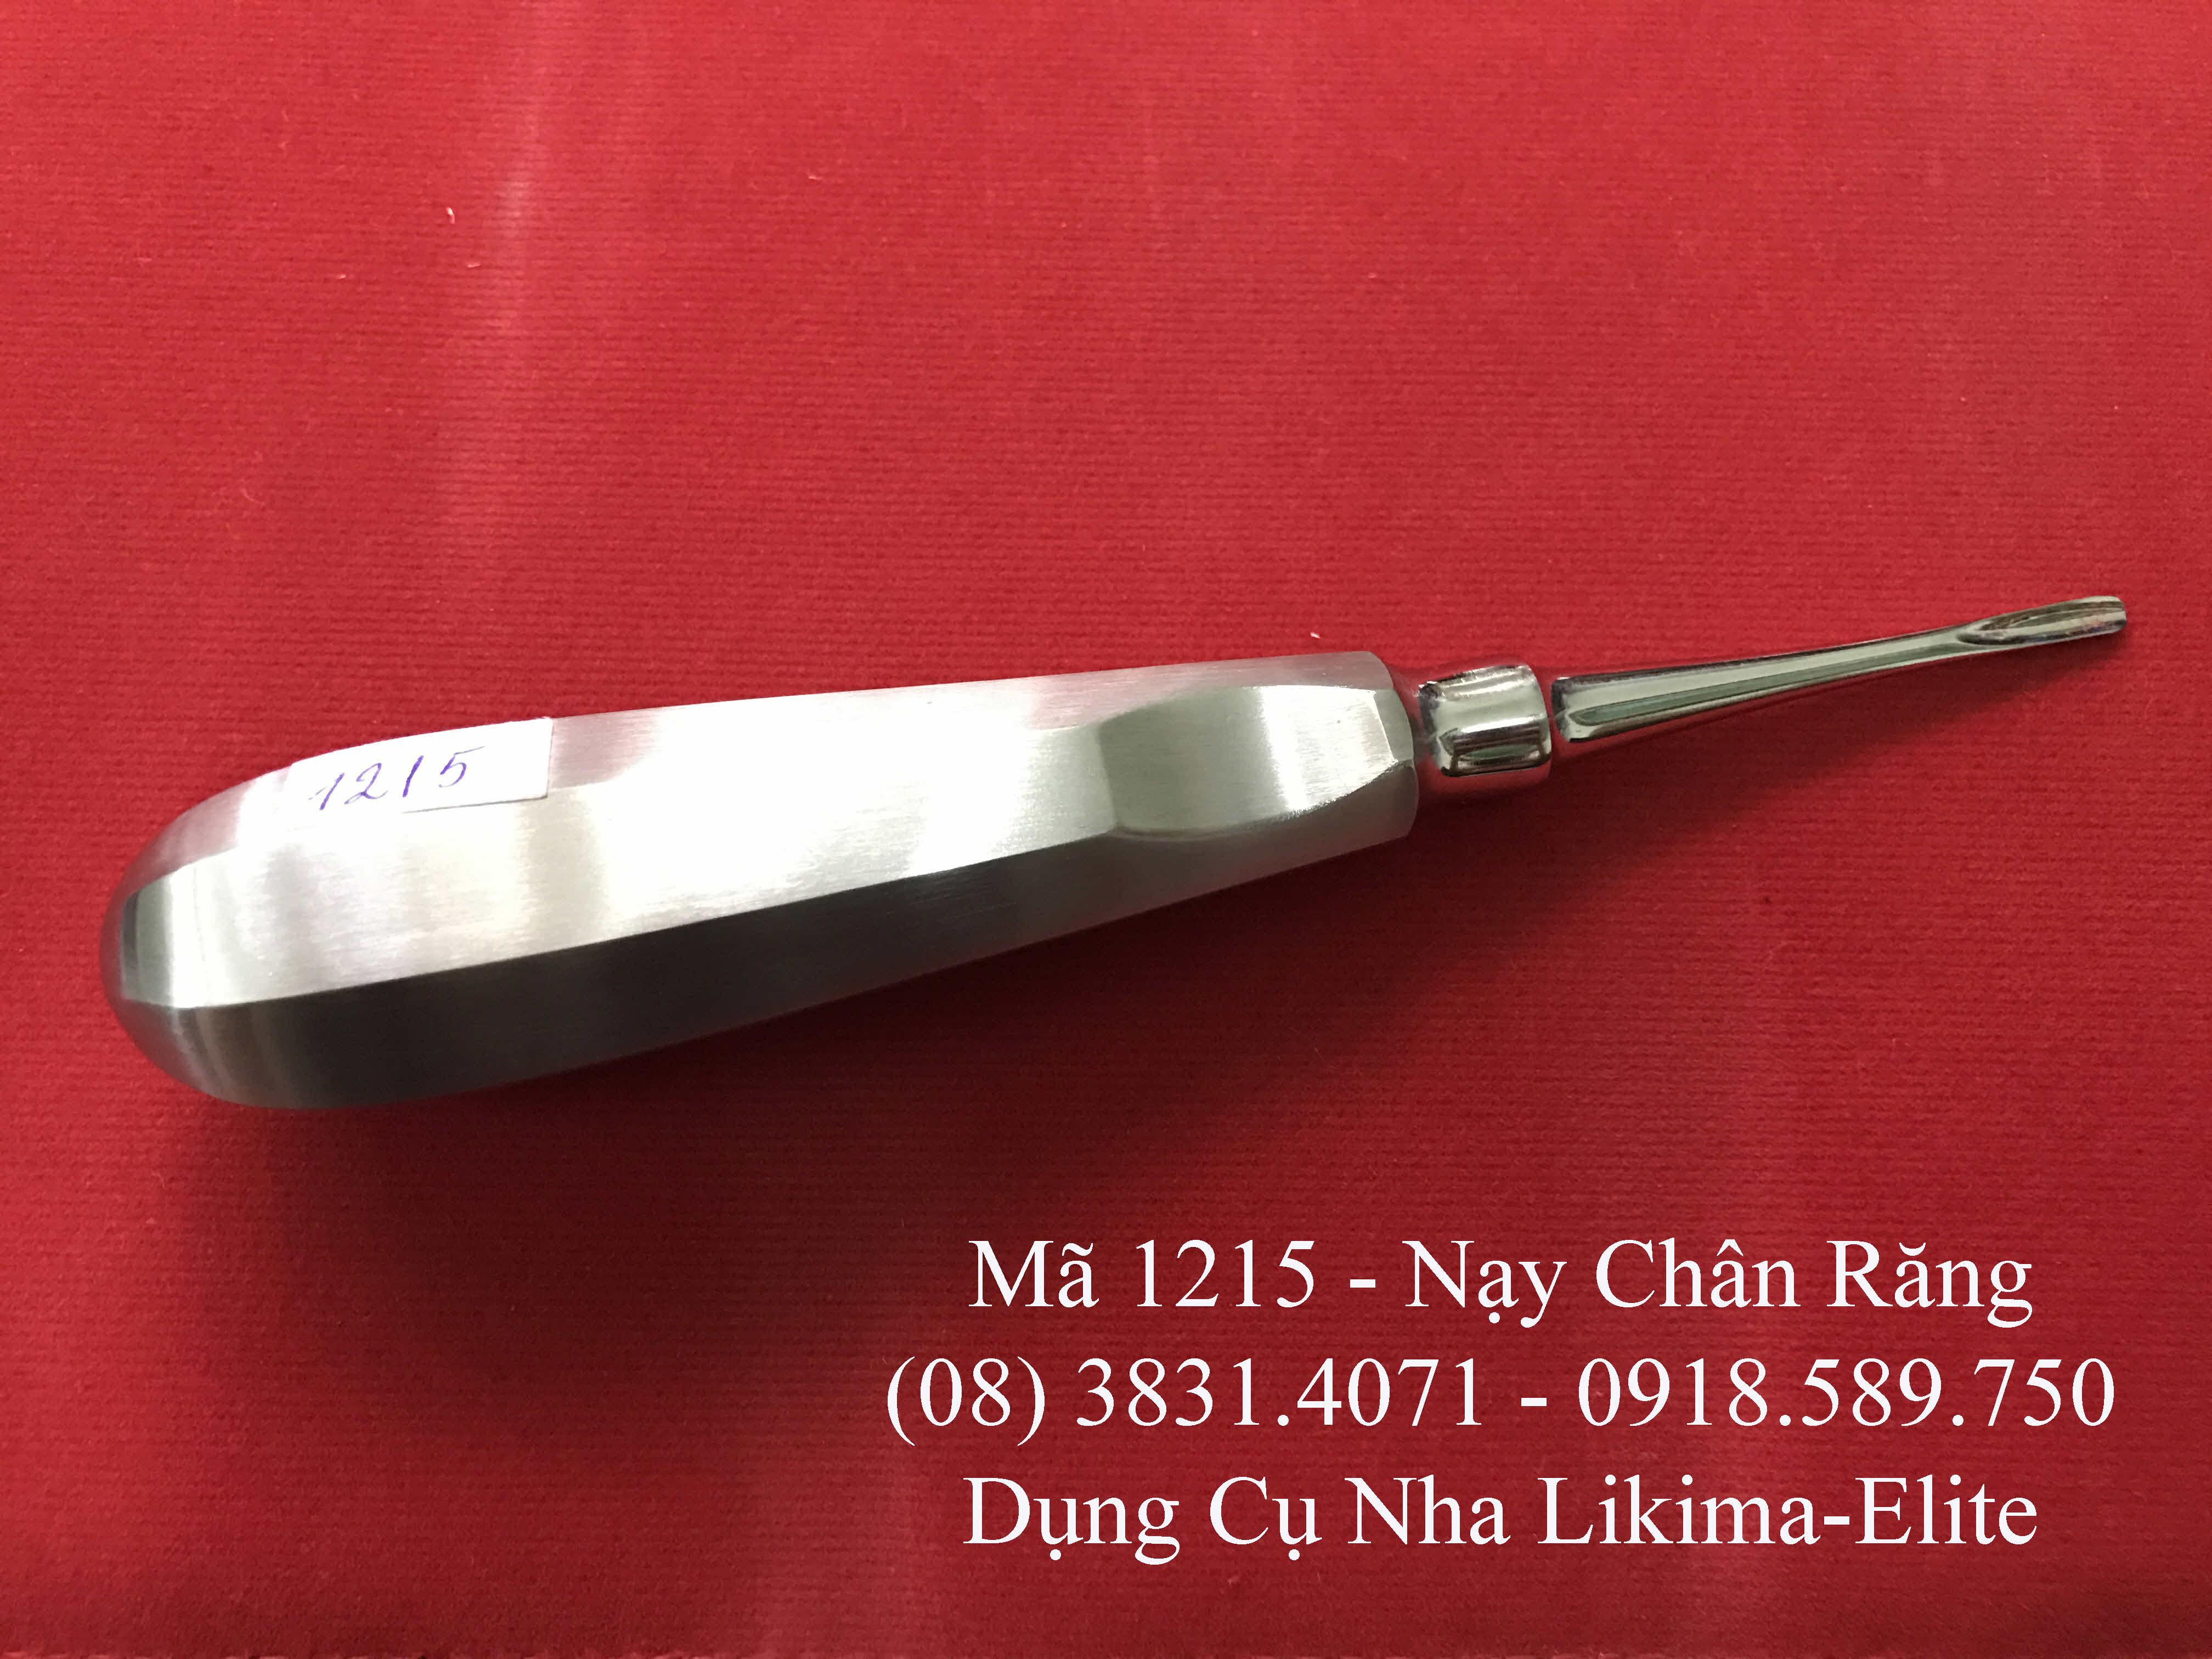 bay-chan-rang-va-rang-ham-tren-1215